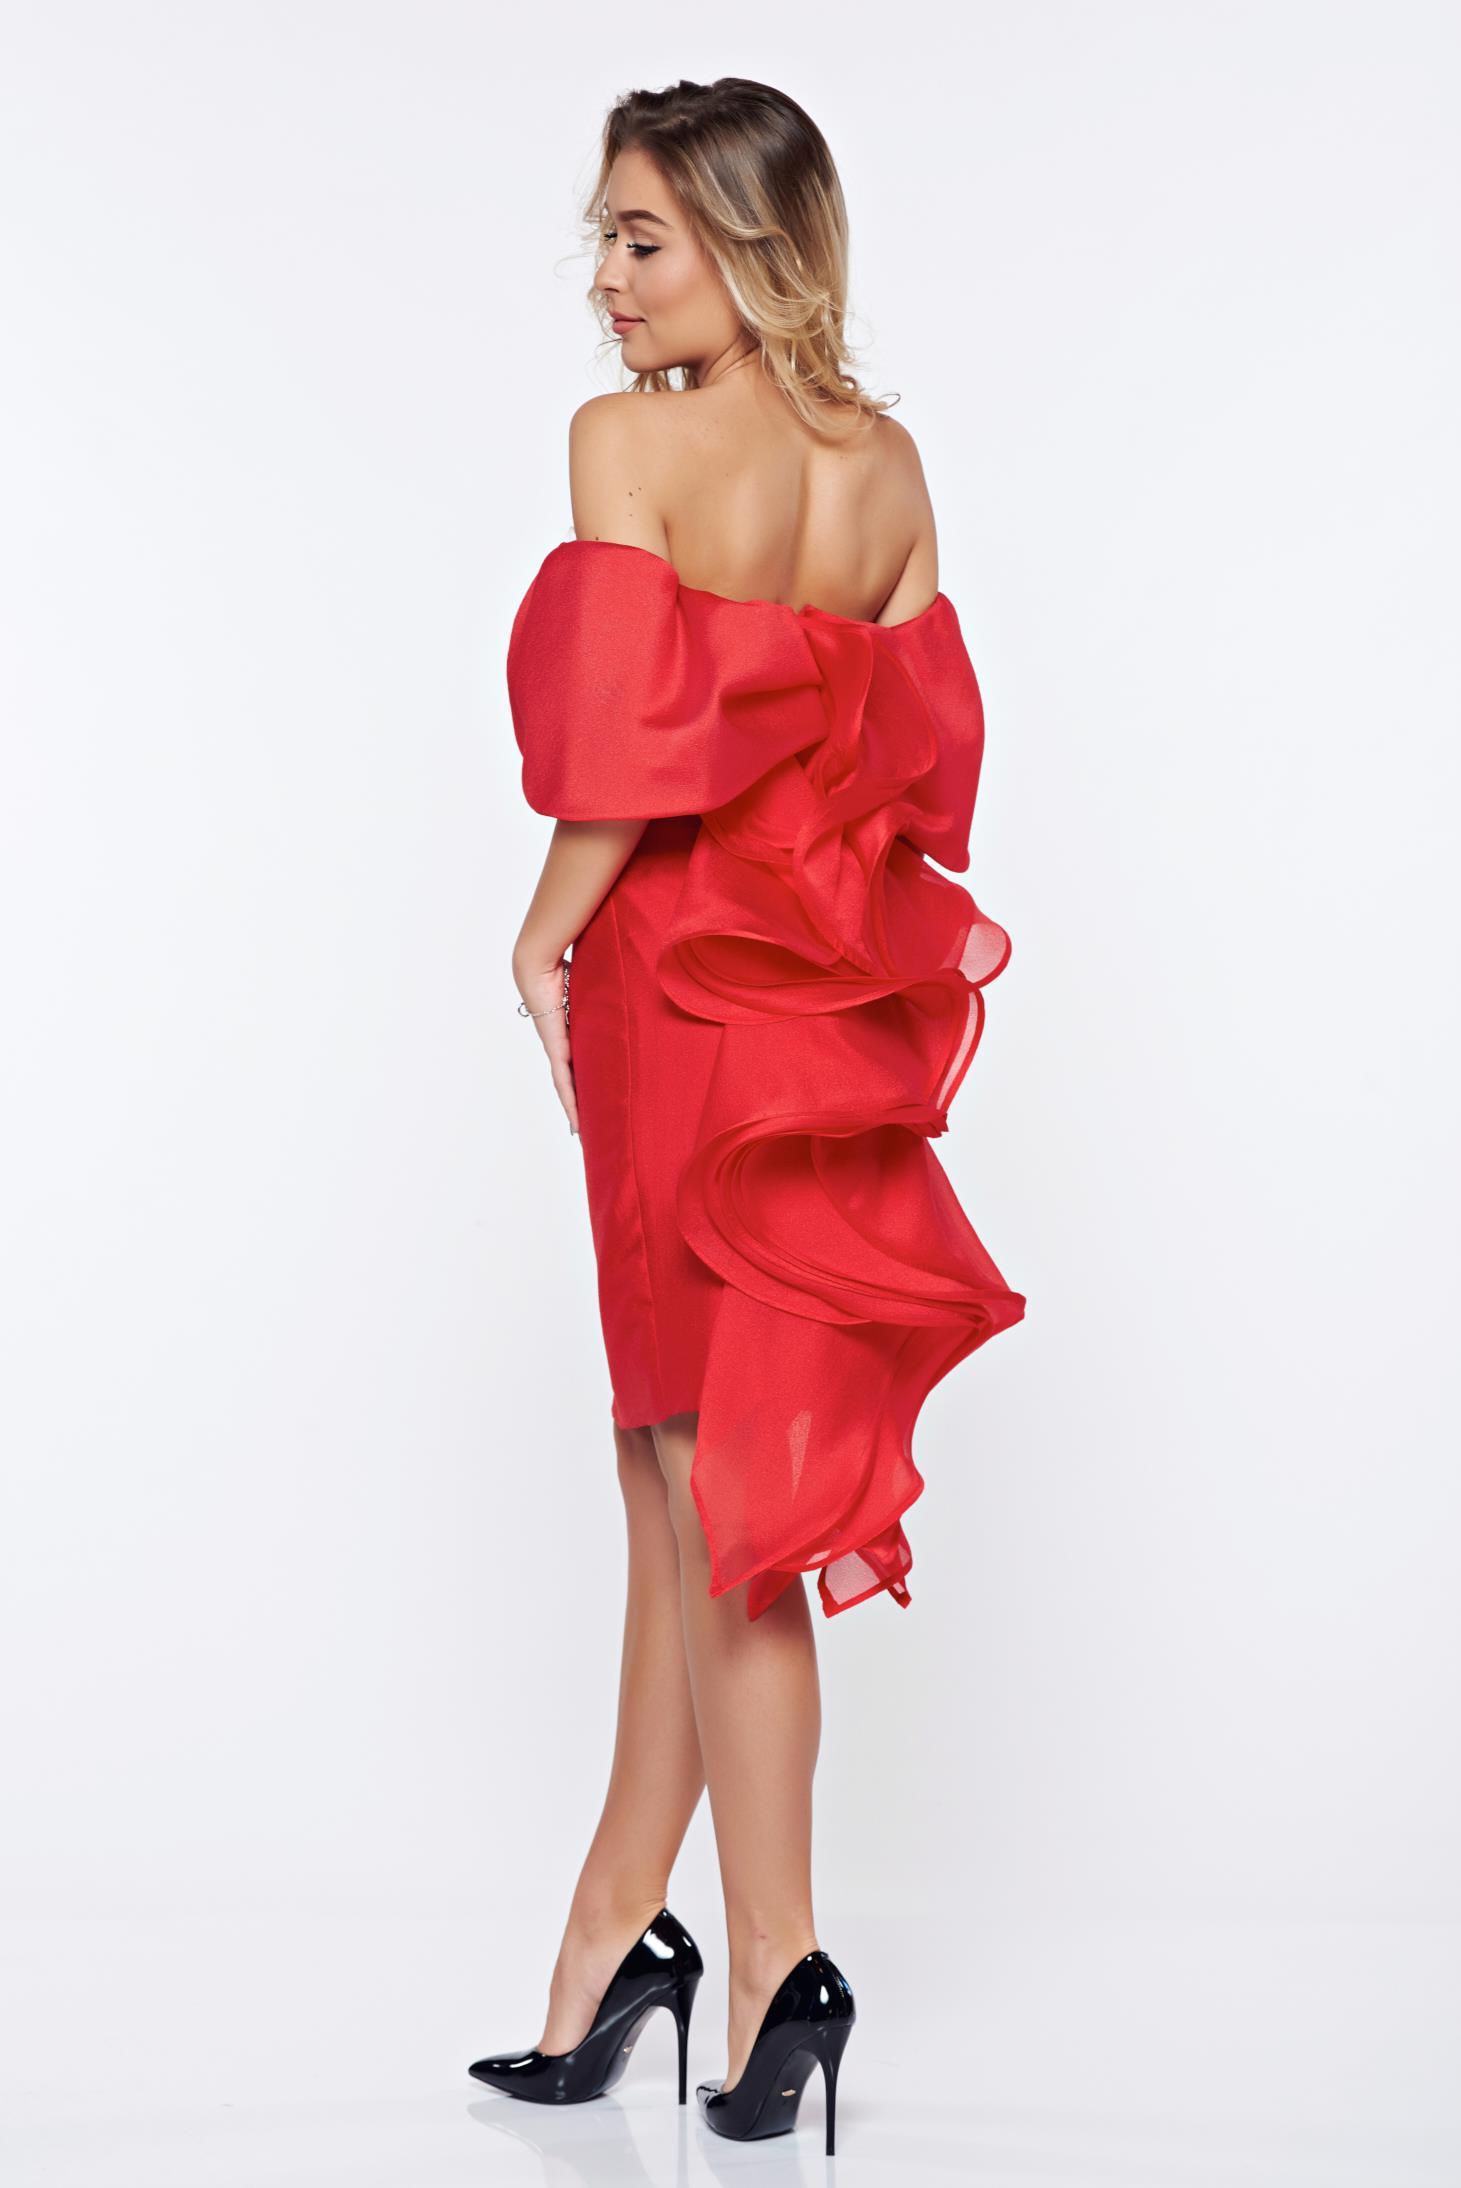 Piros Ana Radu alkalmi fodros ruha a vállakon ea238e6dda